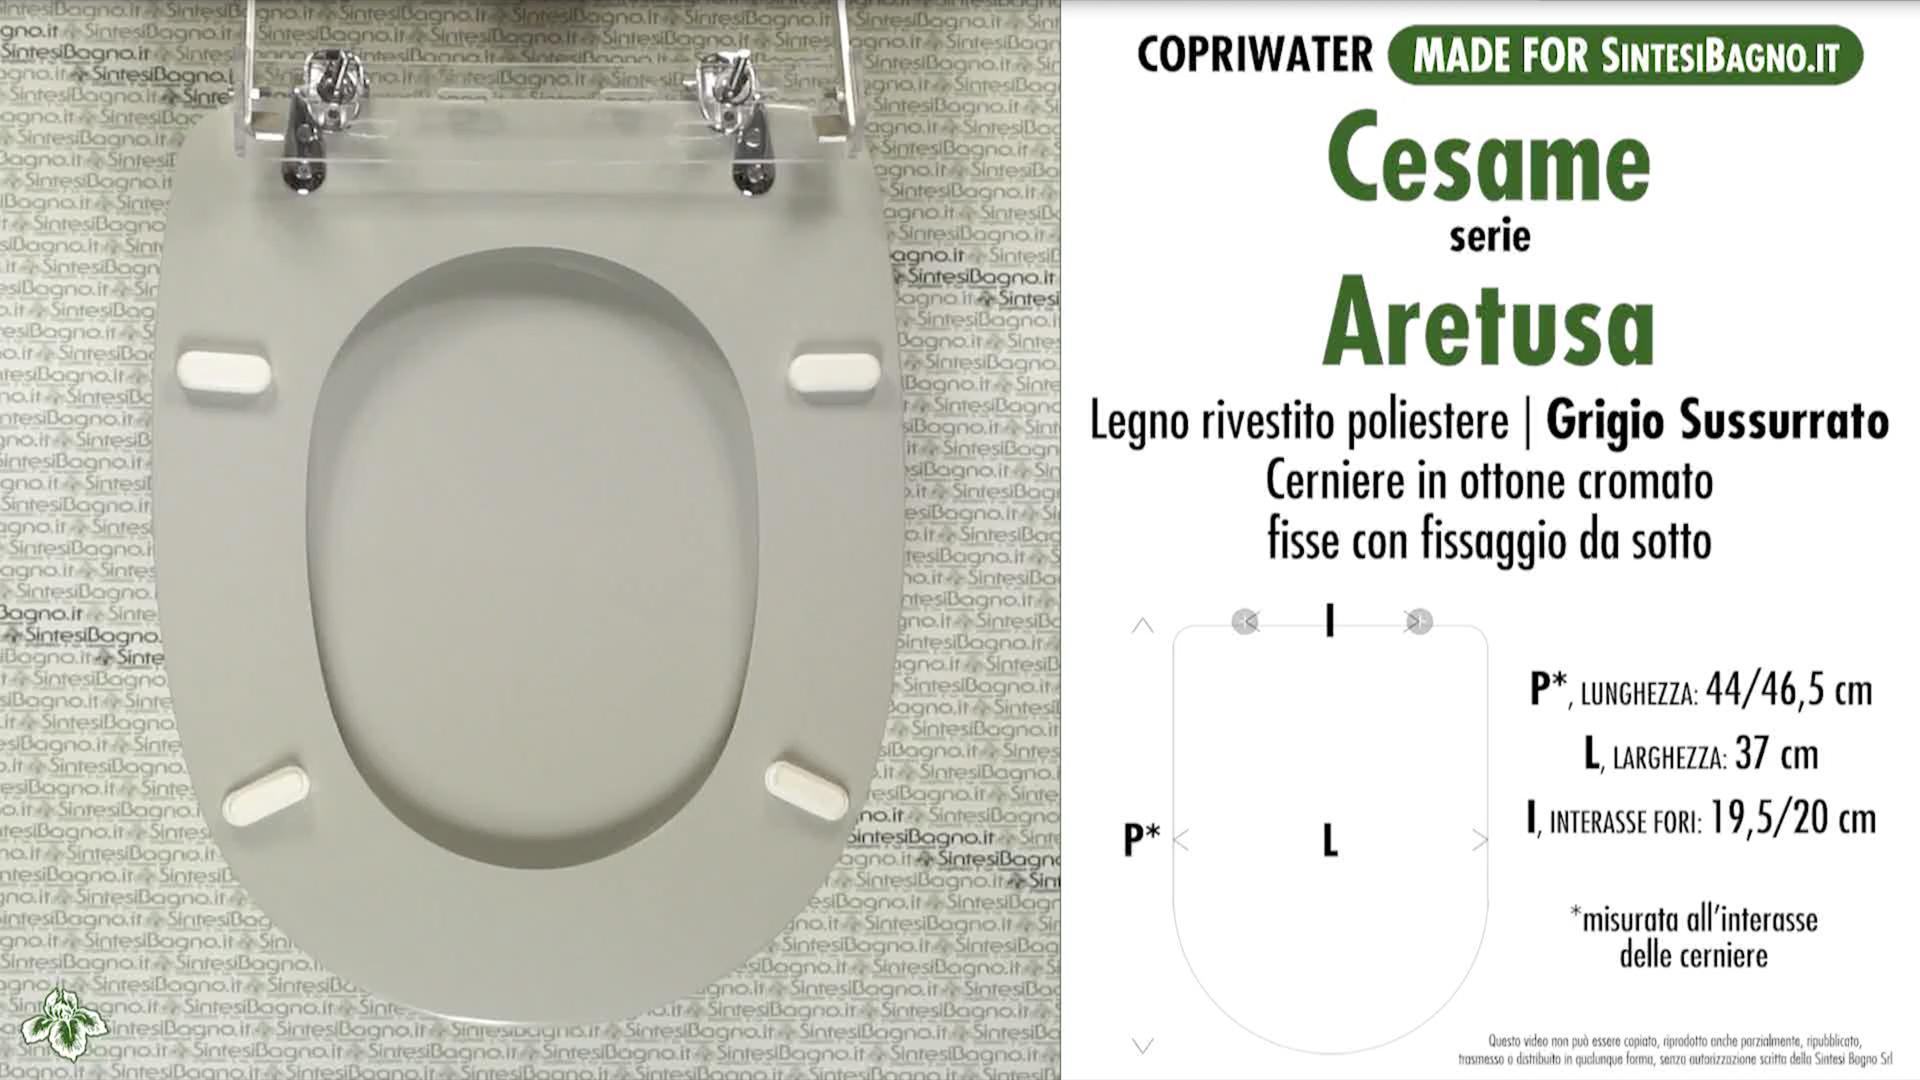 scheda-tecnica-datasheet-copriwater-cesame-serie-aretusa-grigio-sussurrato